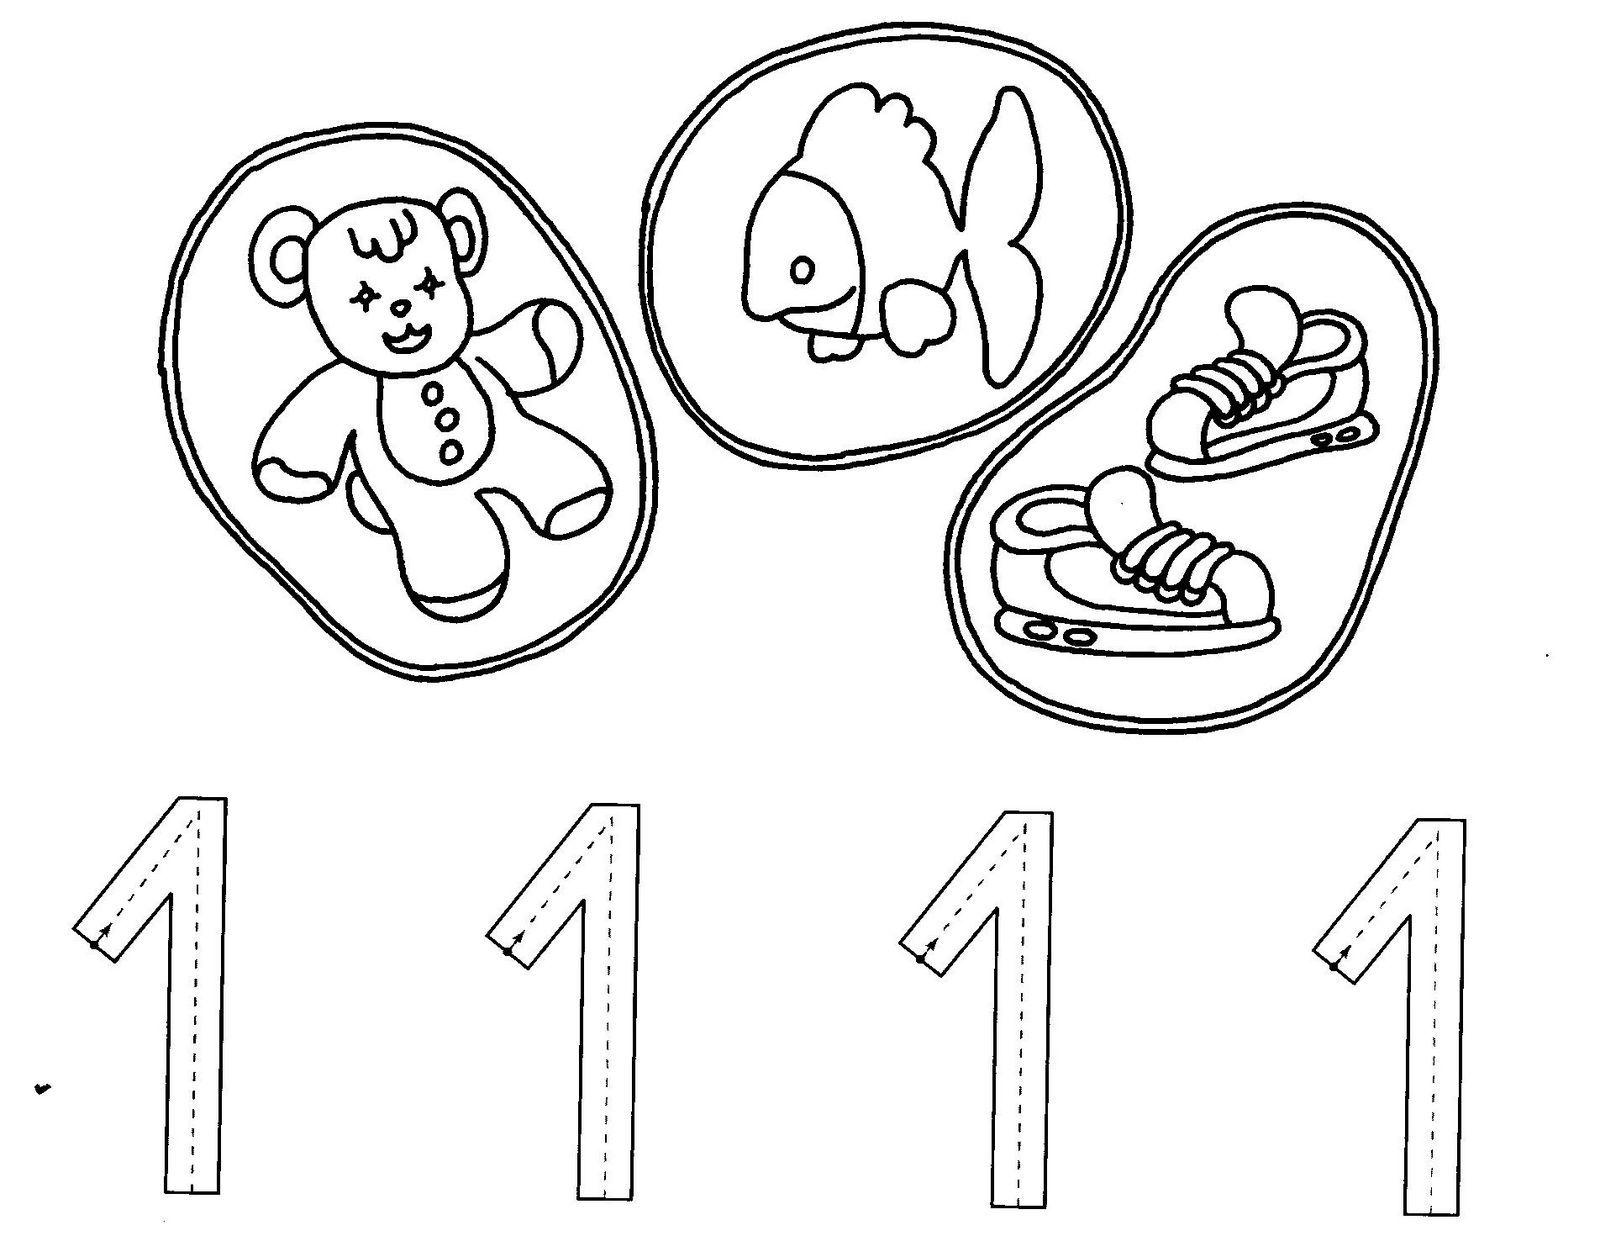 Fichas Infantiles: Fichas del número 1   zenbakiak   Pinterest ...